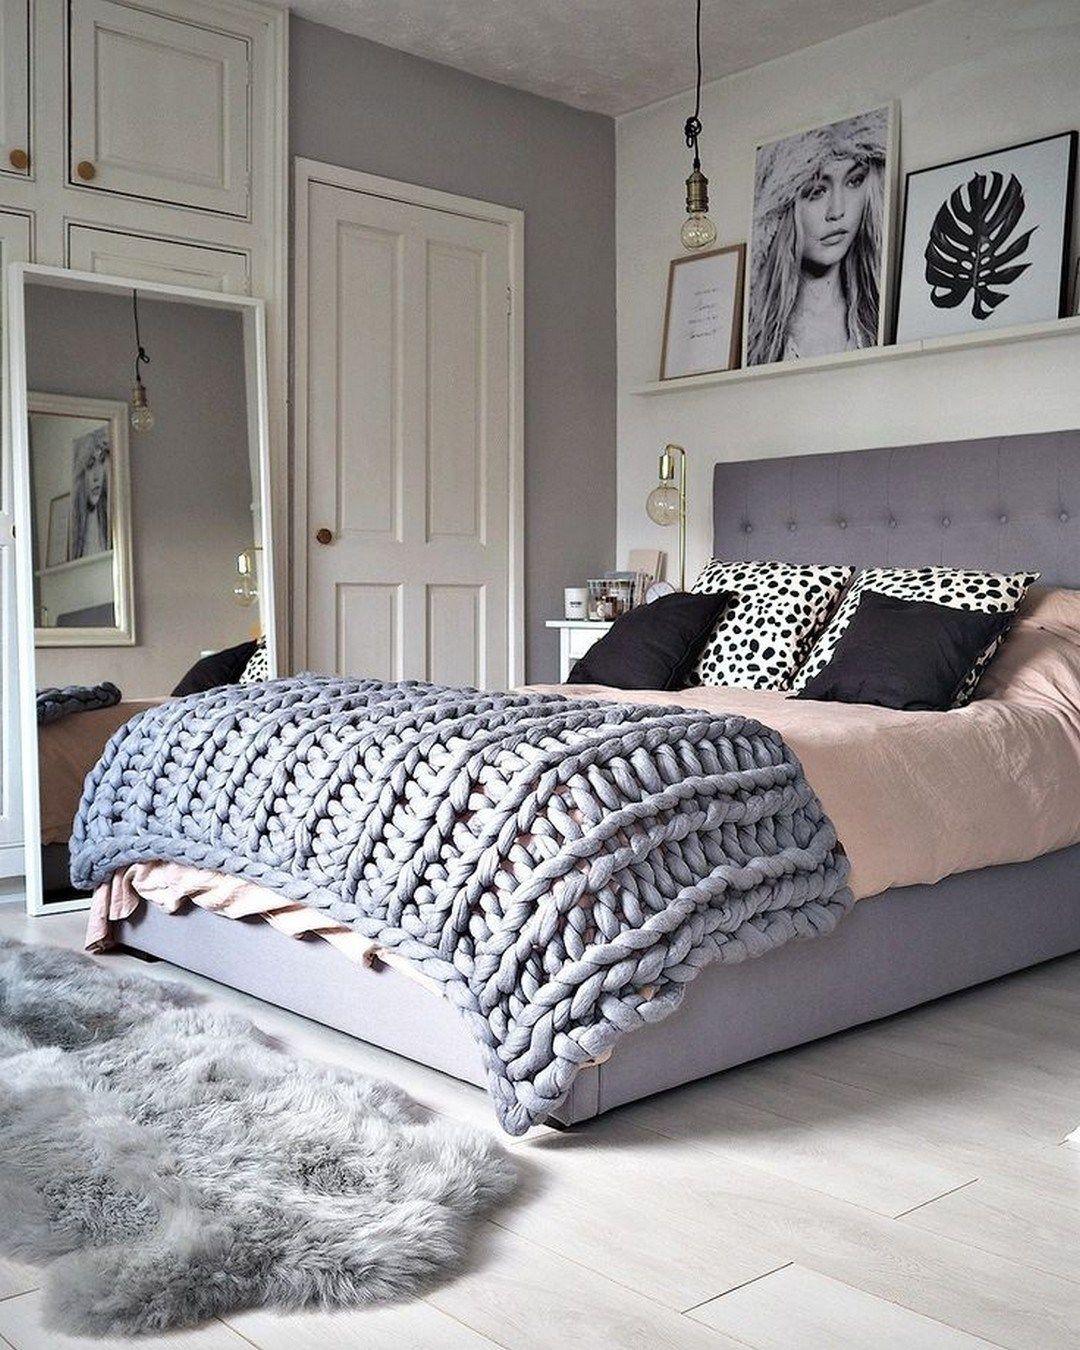 Bedroom decorating master bedroom ideas  Beautiful Master Bedroom Decorating Ideas   Room Ideas